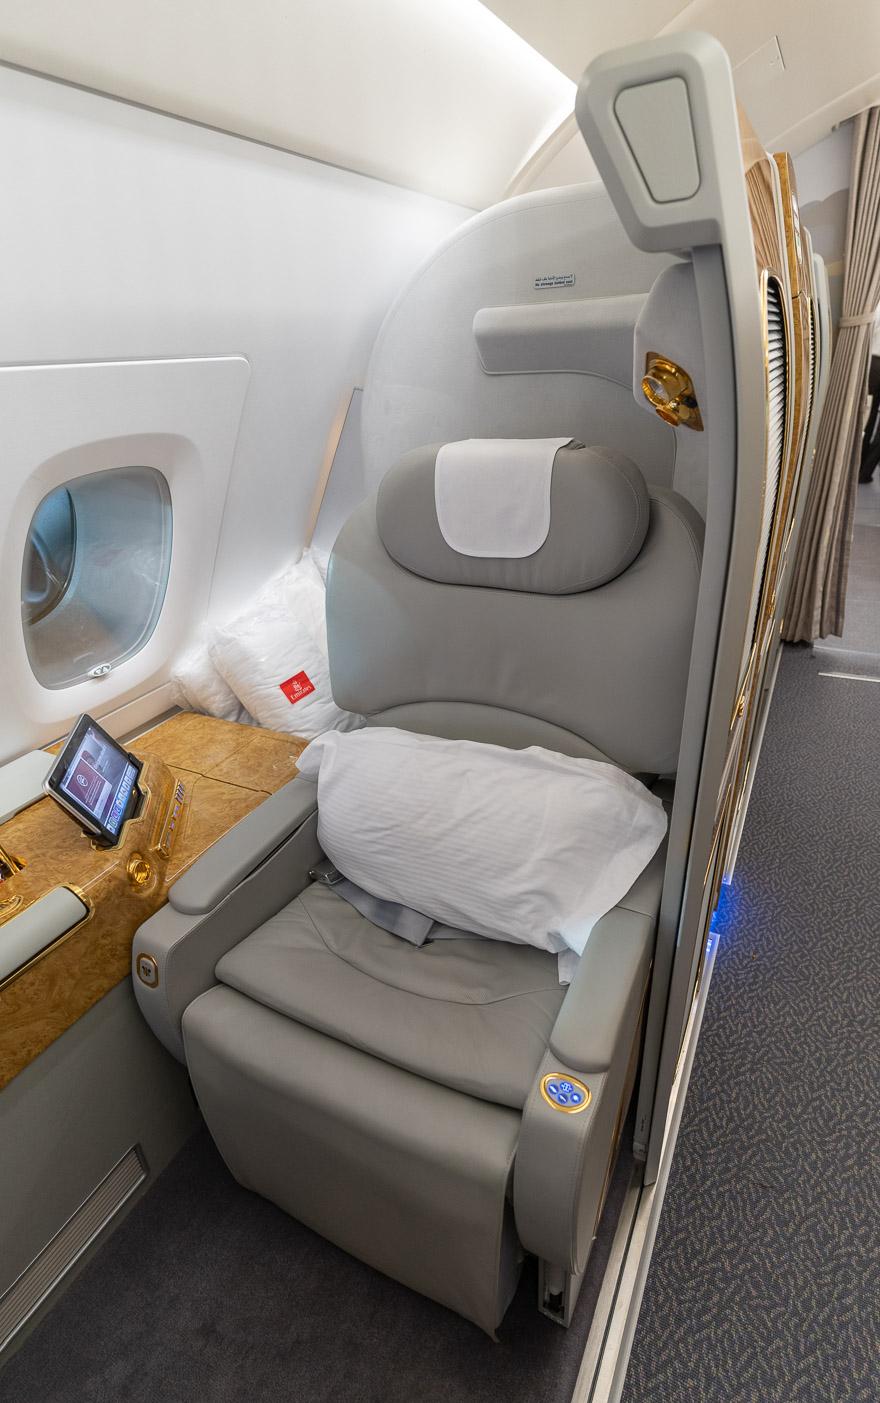 EK A380 F LGW DXB 7 - REVIEW - Emirates : First Class - A380 - London (LGW) to Dubai (DXB)